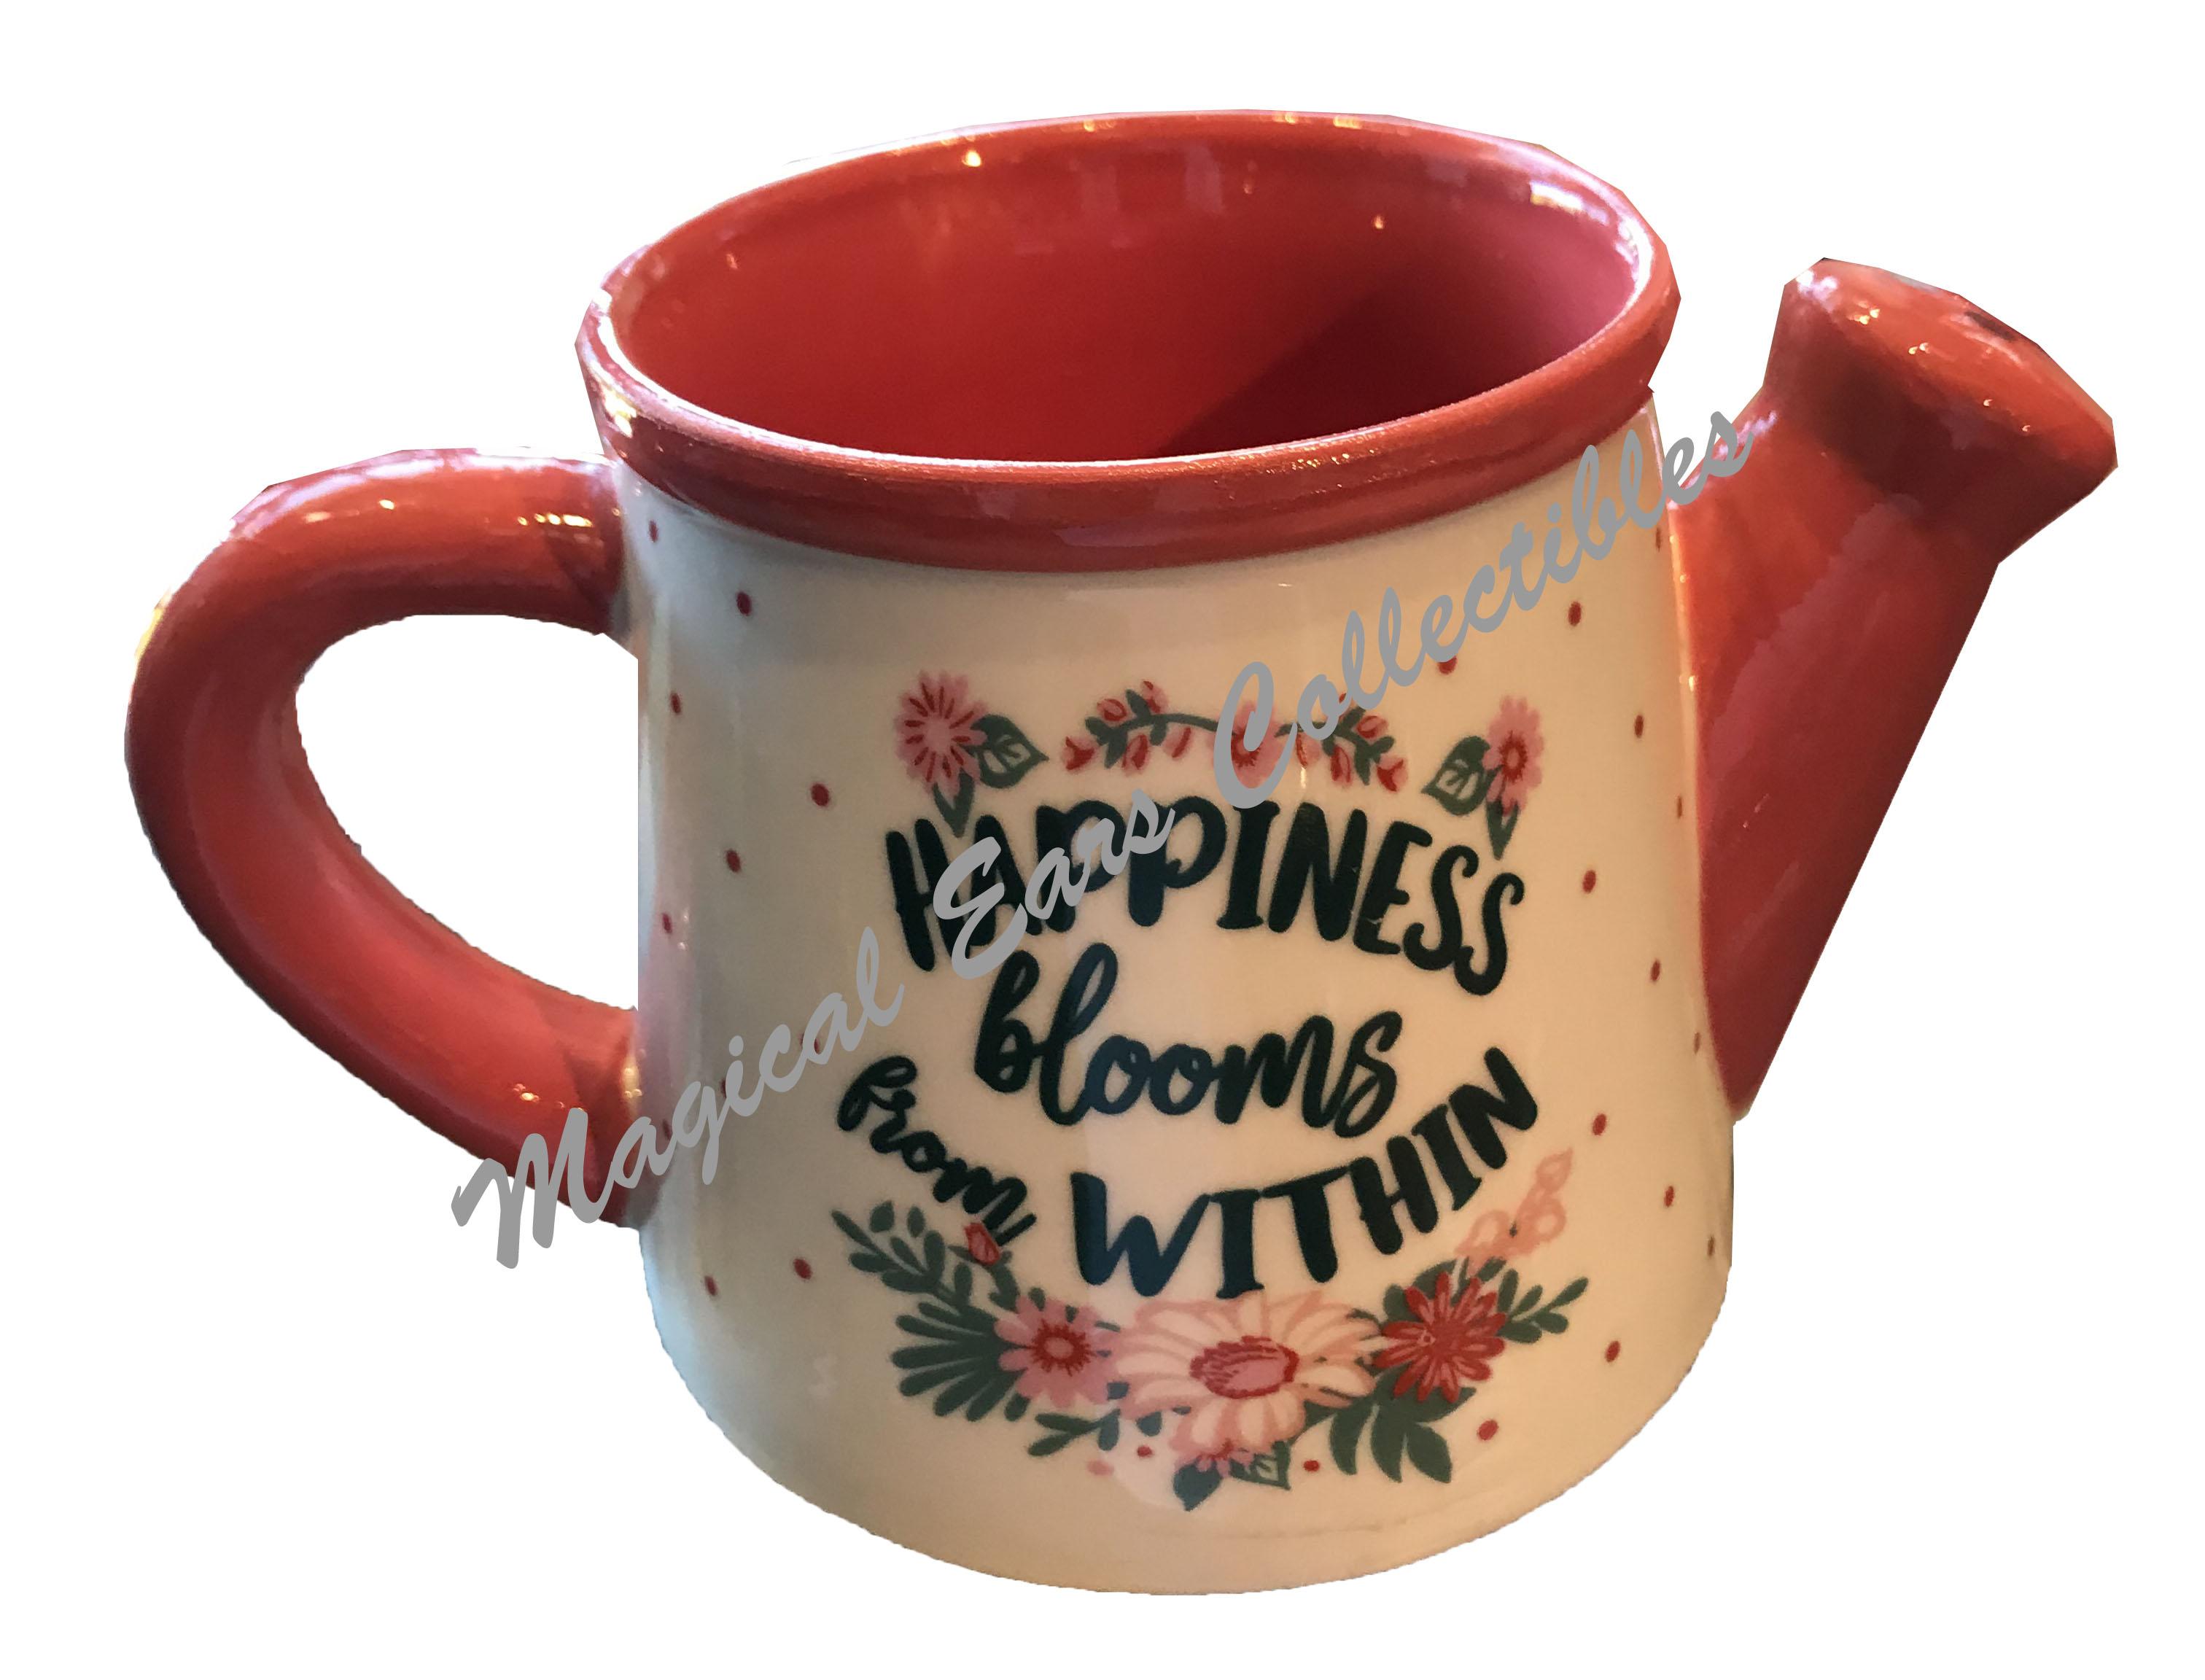 disney coffee mug - 2019 epcot flower and garden - minnie watering can